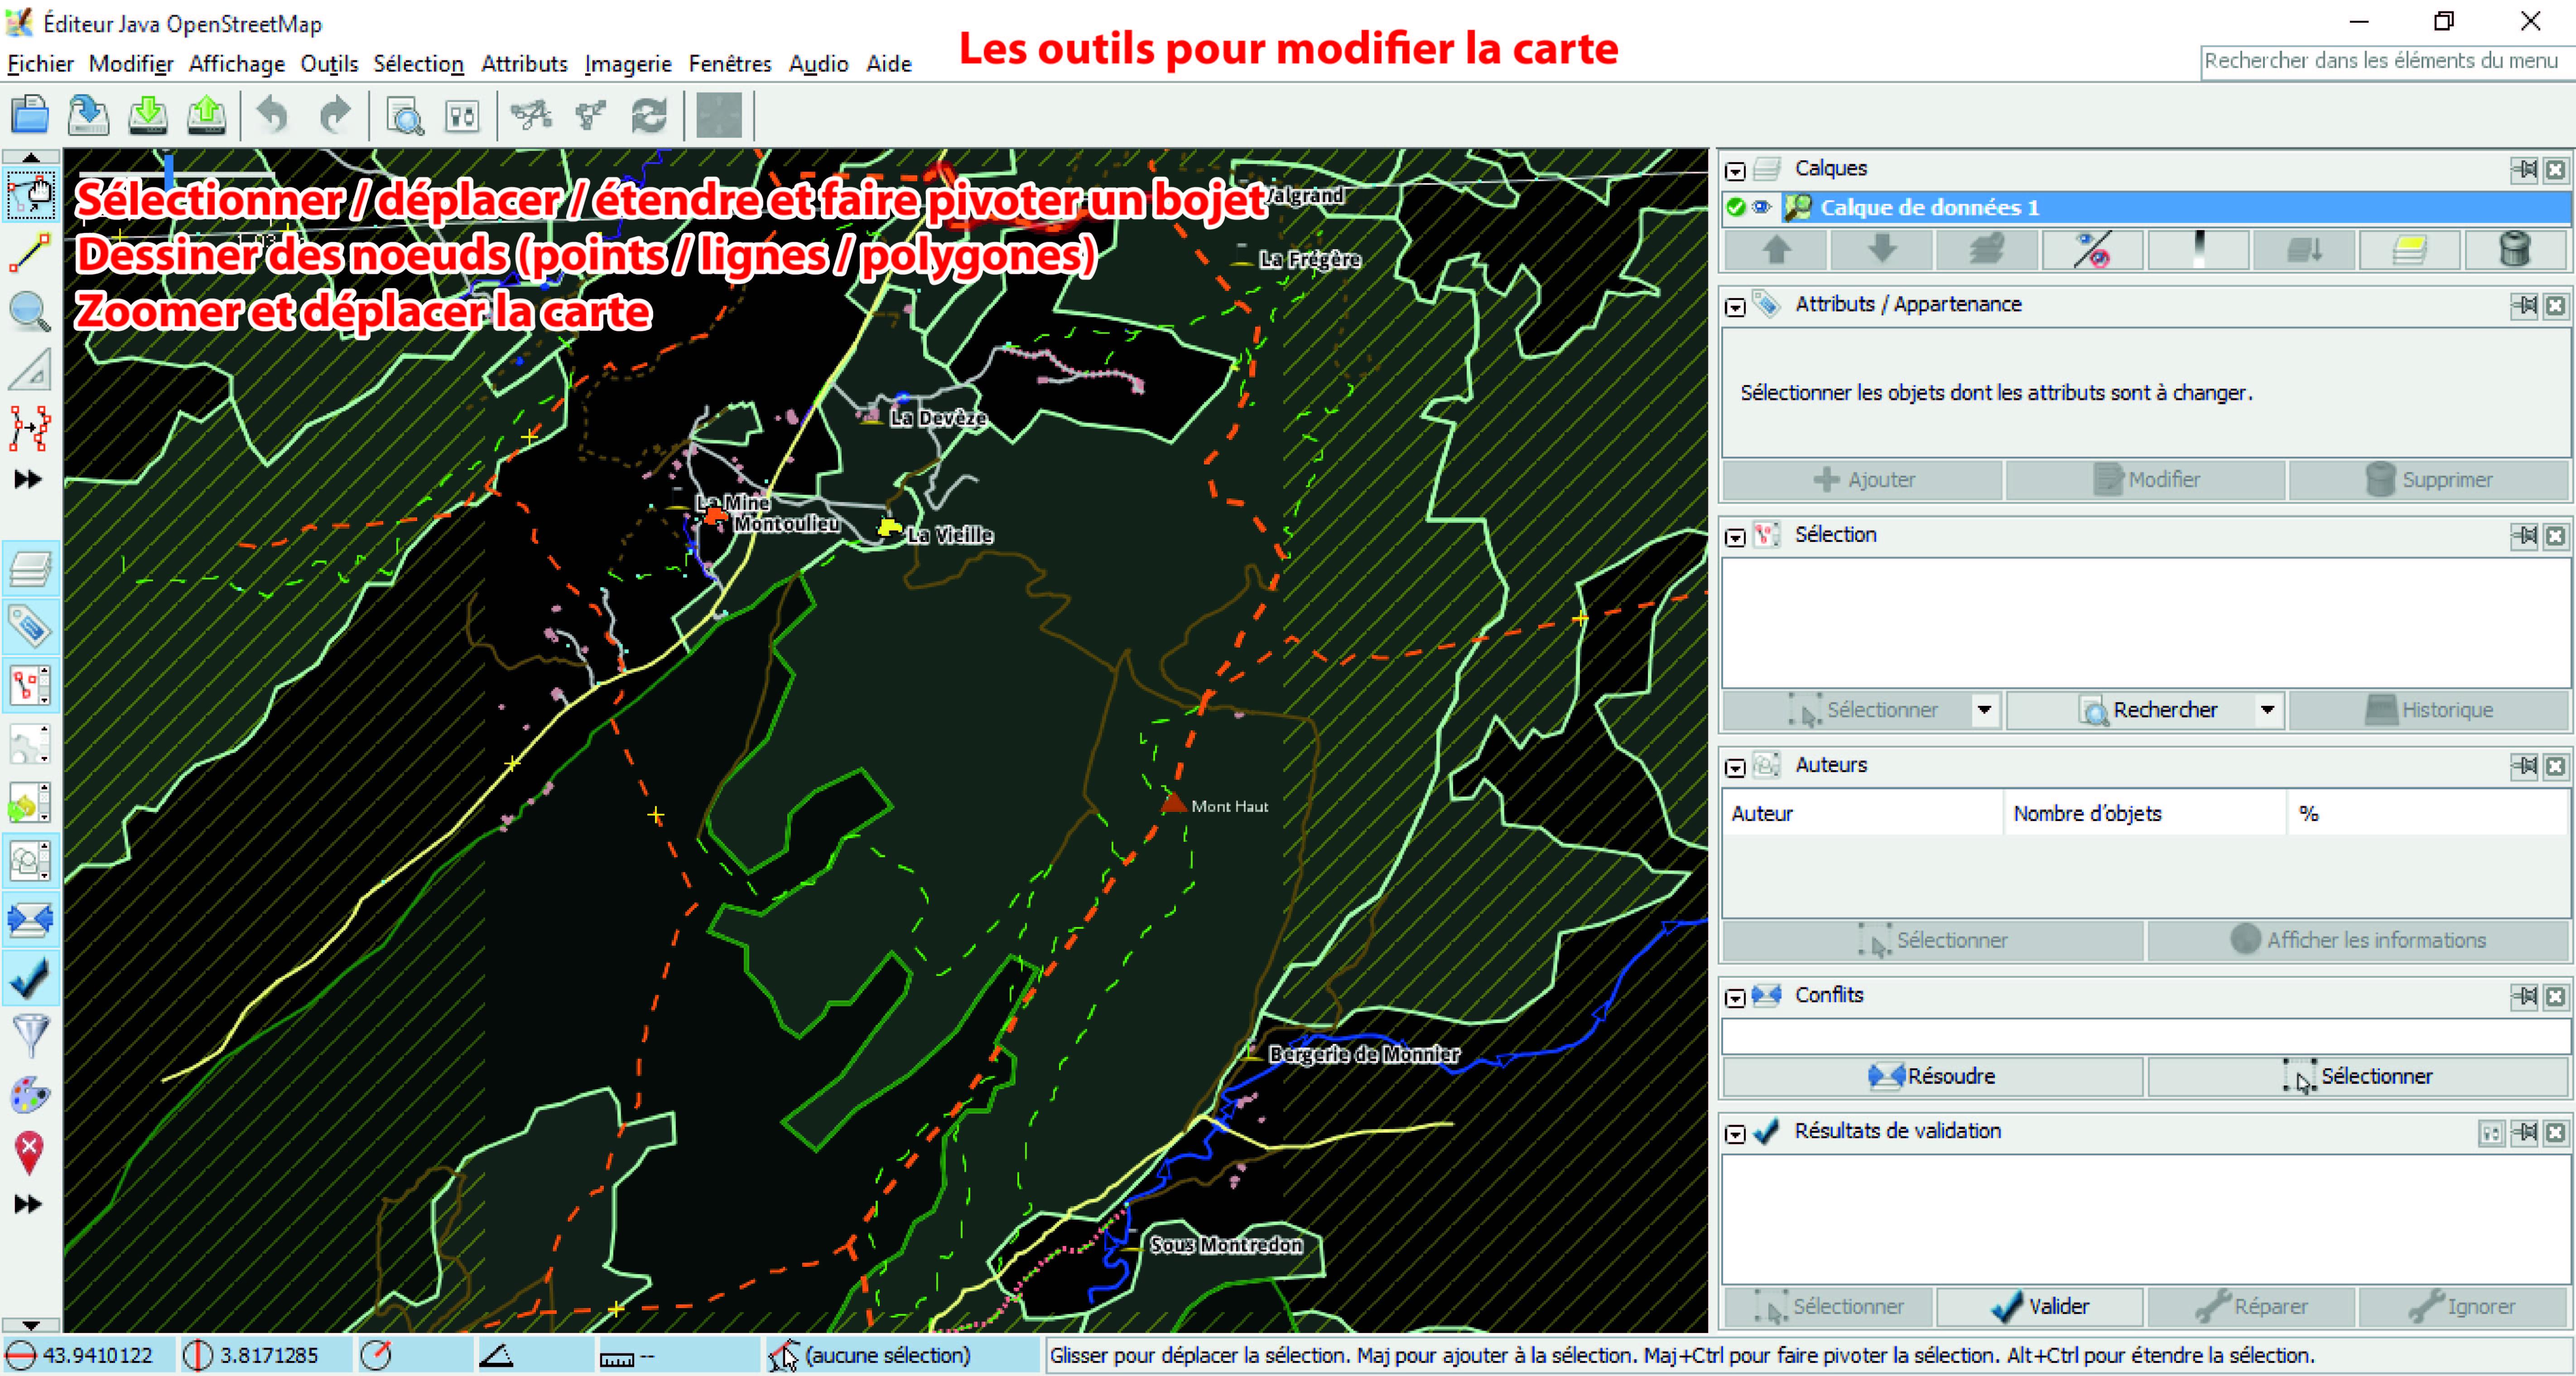 image TUTO_JOSM05.jpg (4.3MB)